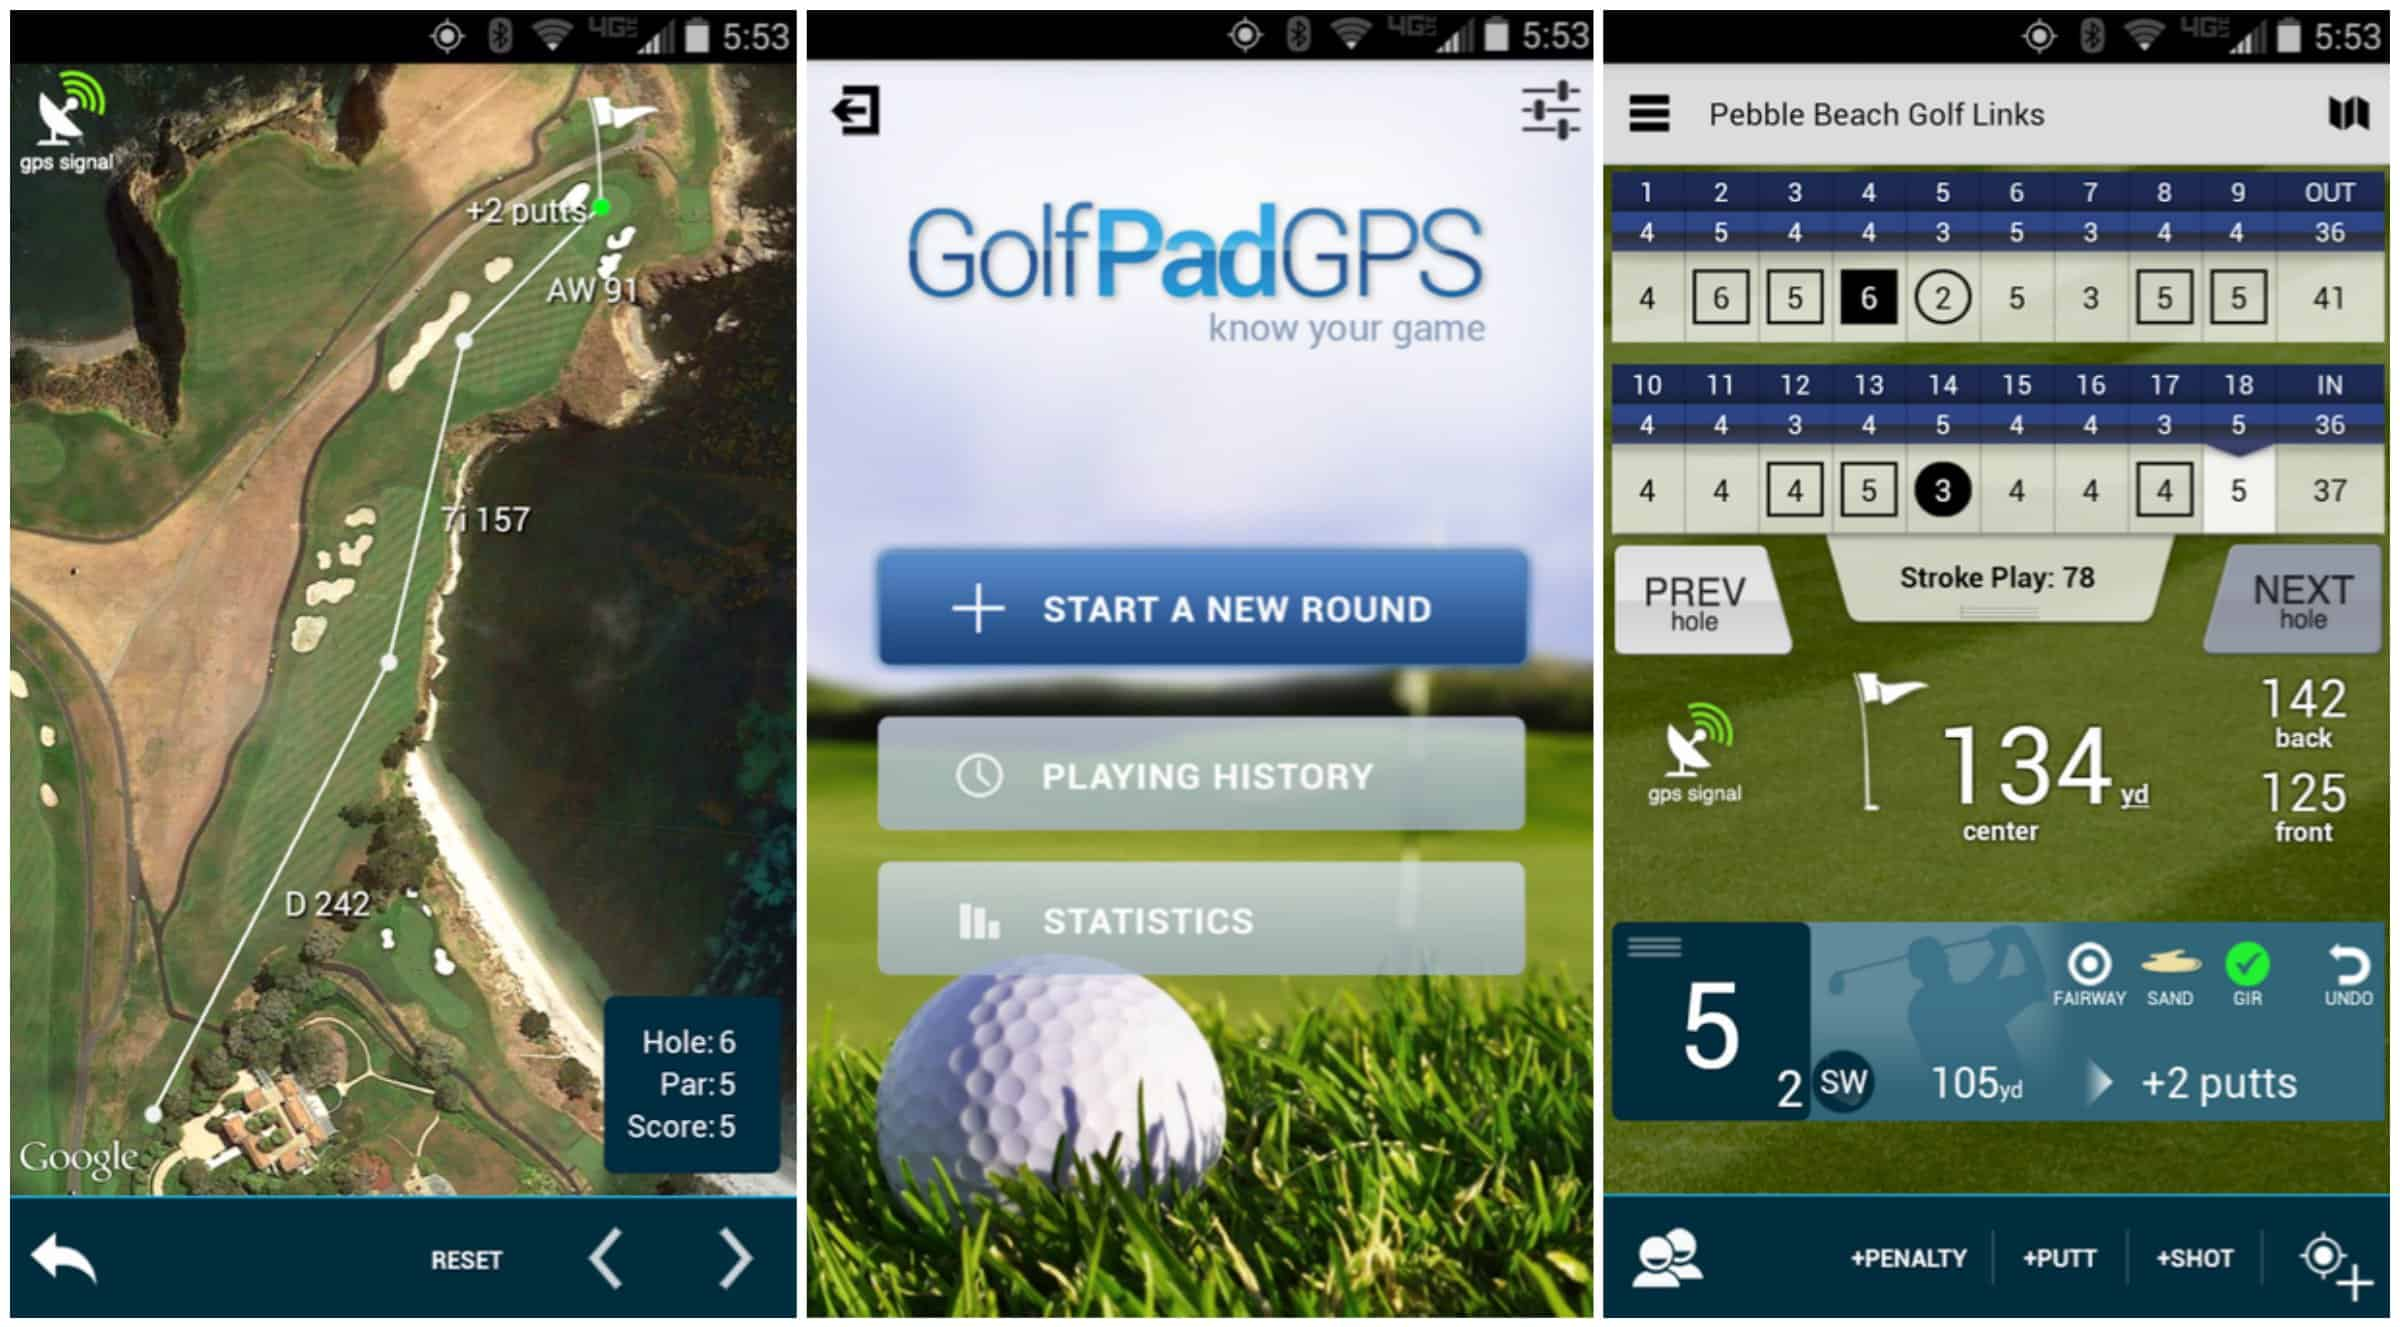 Golf Pad GPS